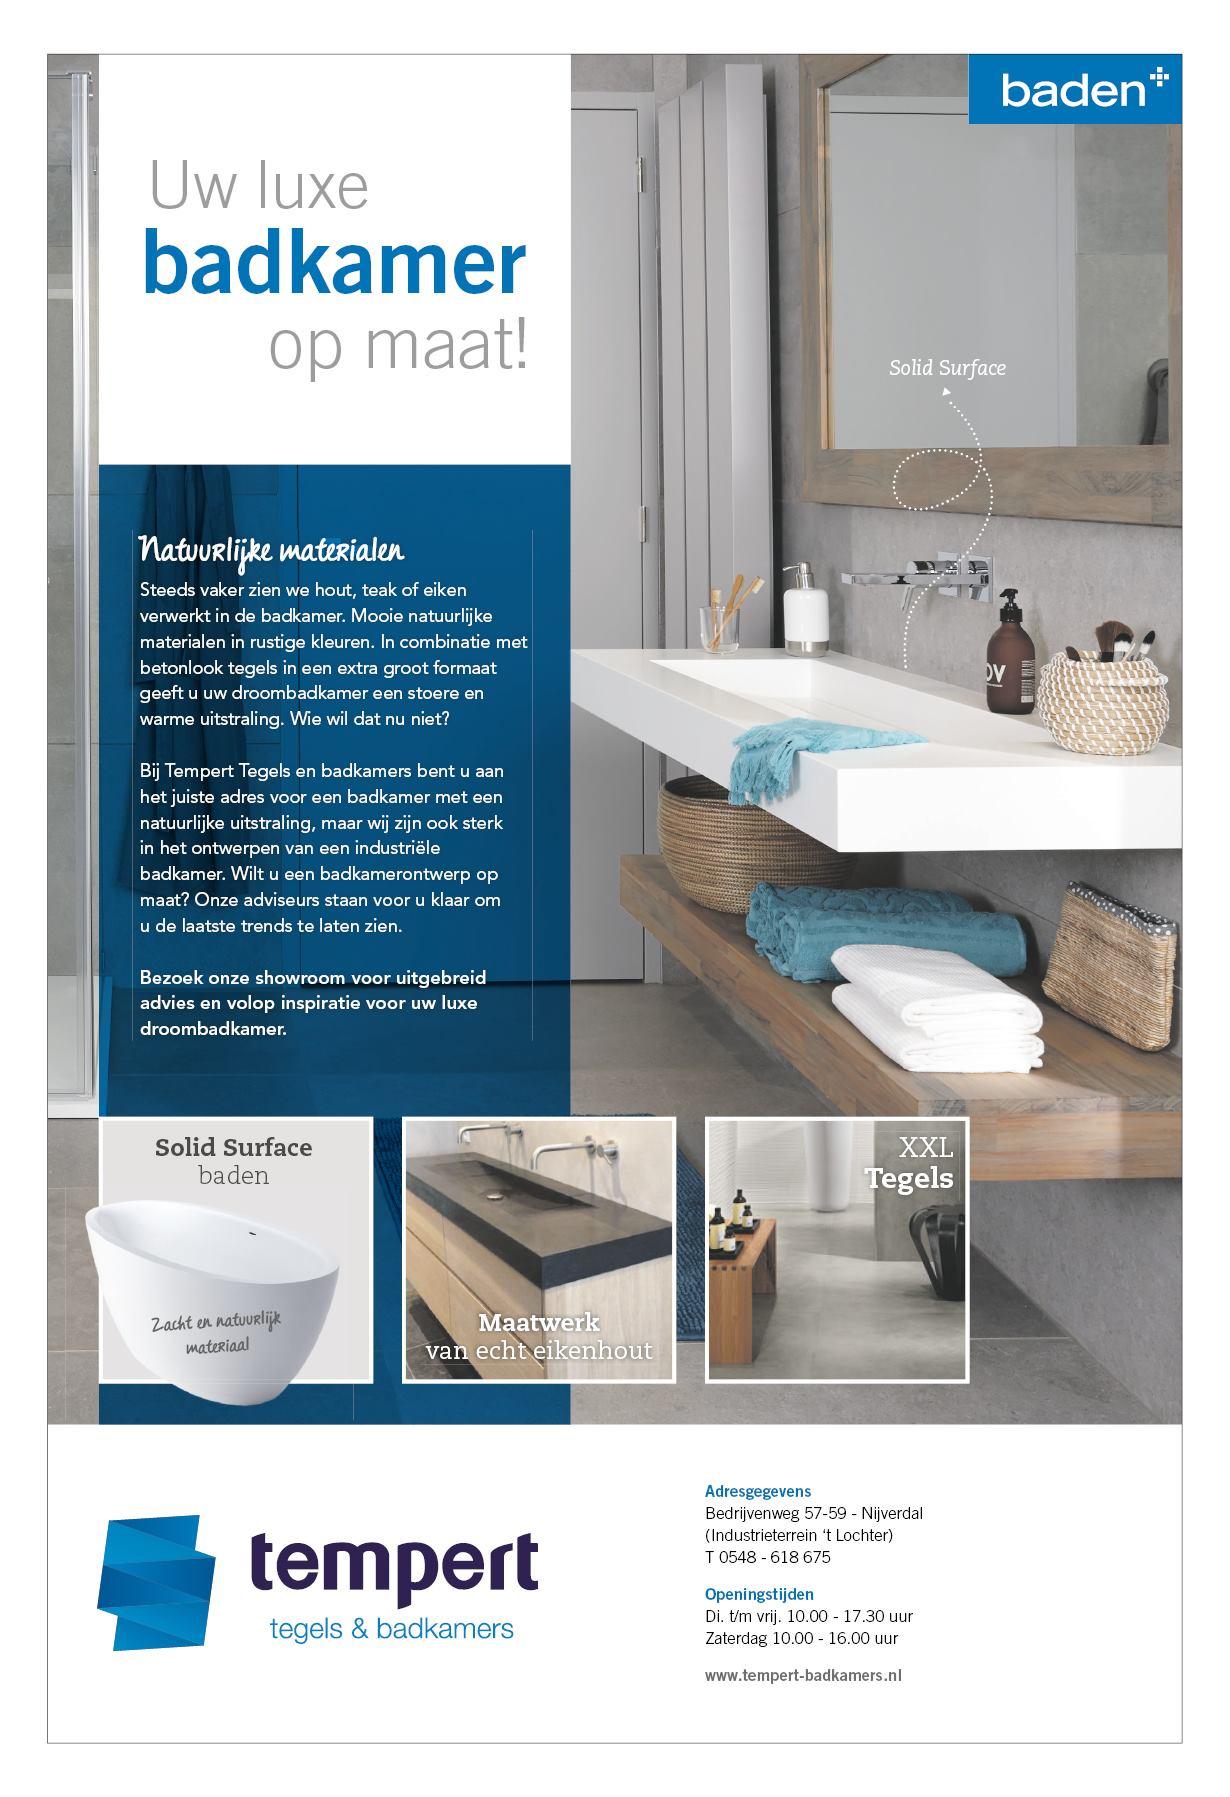 Hart van Nijverdal 21 juli 2017